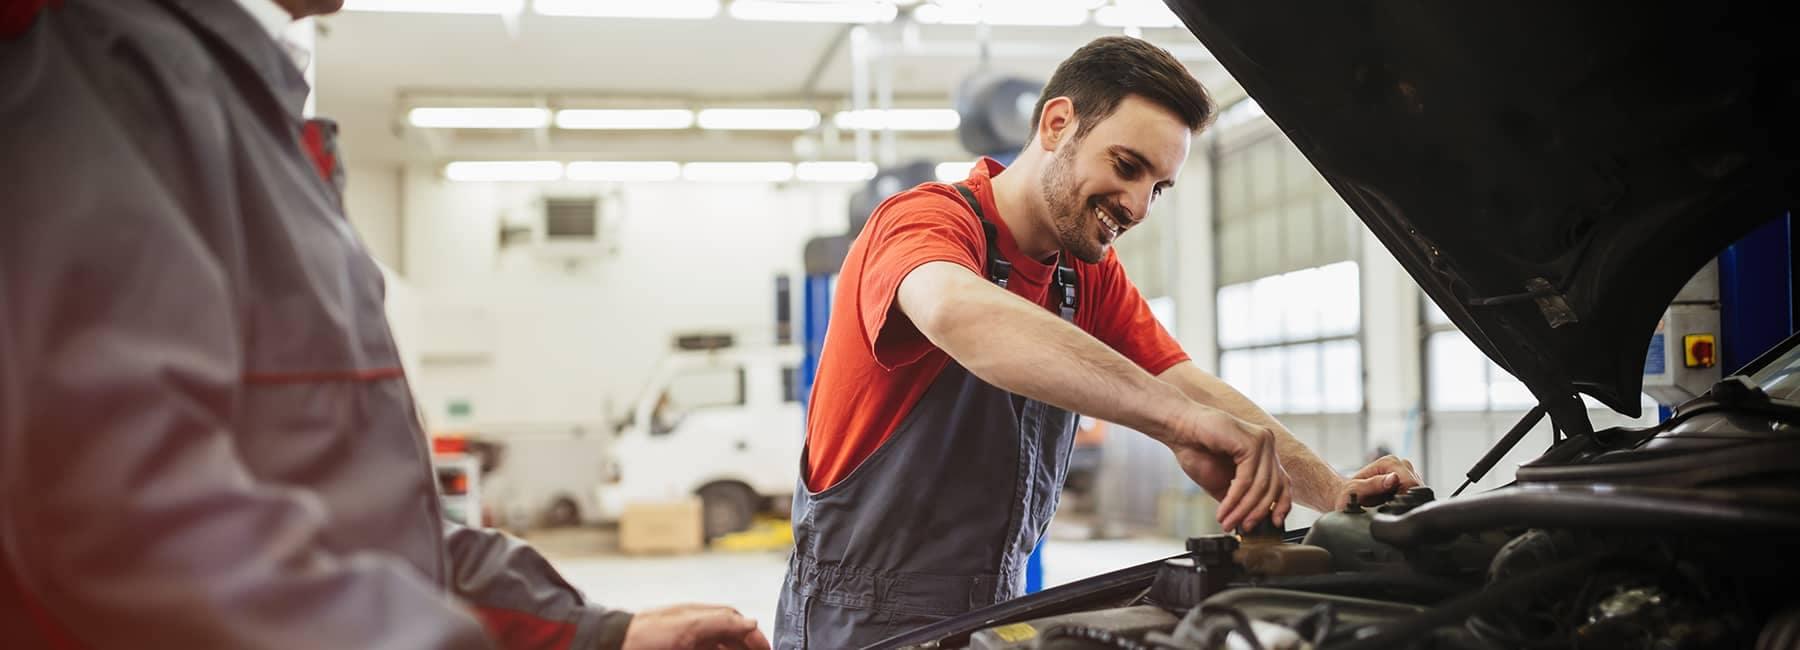 Mechanic Screwing Cap on in Car Engine